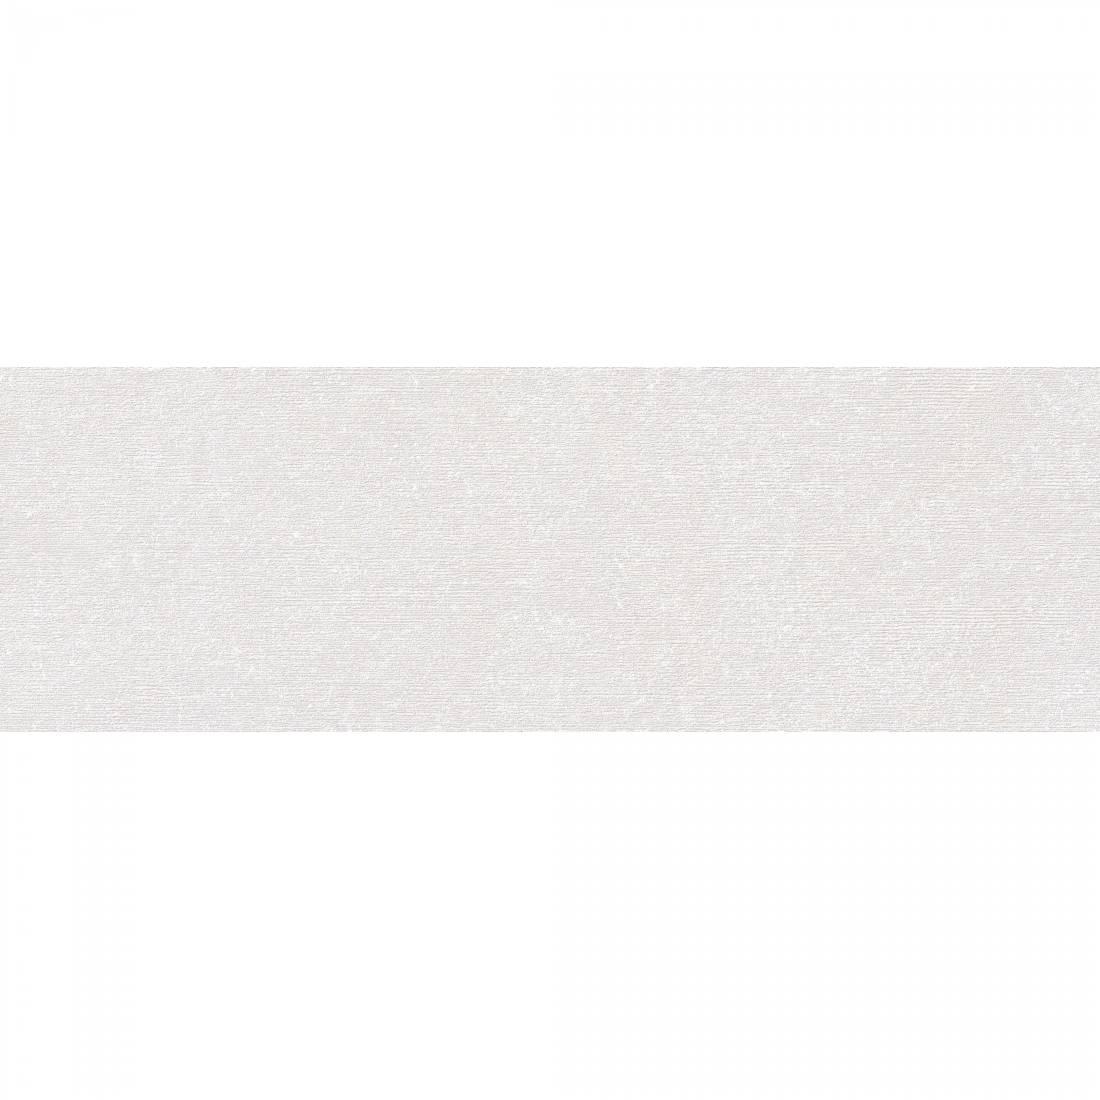 Olite 20x60 Blanco Matt 1